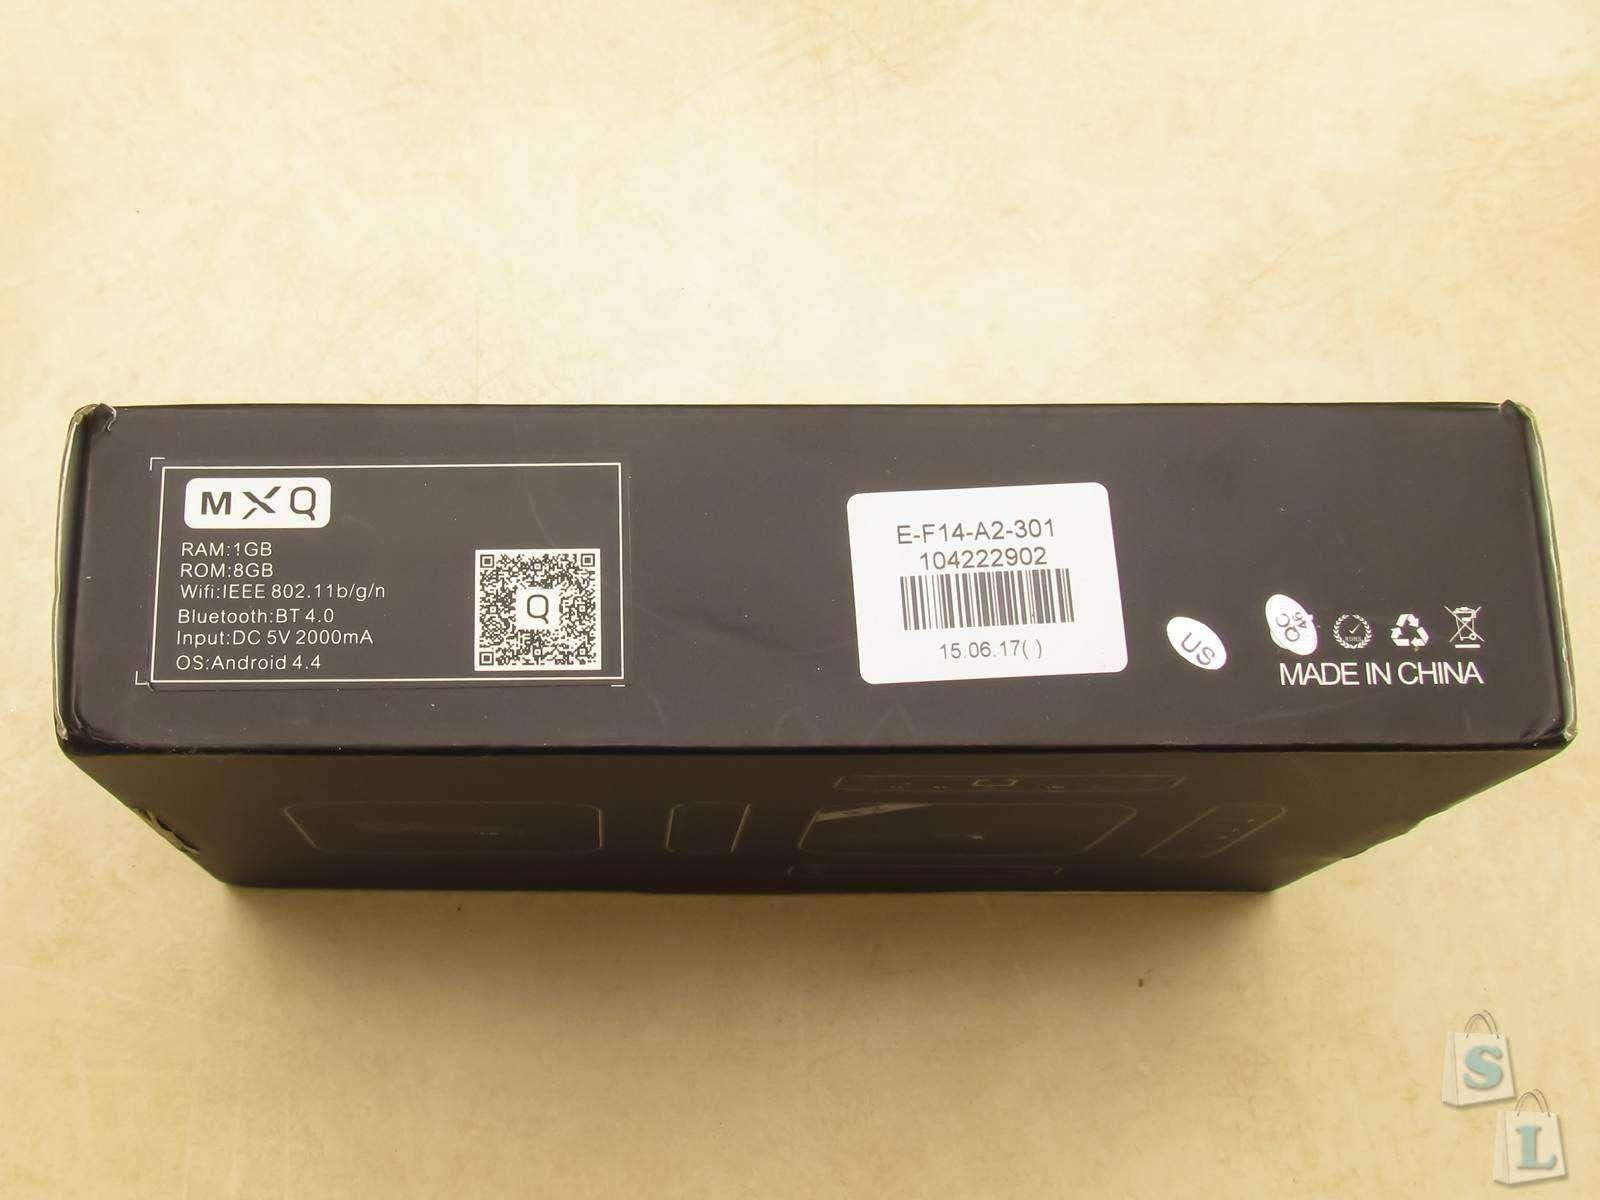 GearBest: Обзор ТВ бокса MXQ S85 Smart TV Box